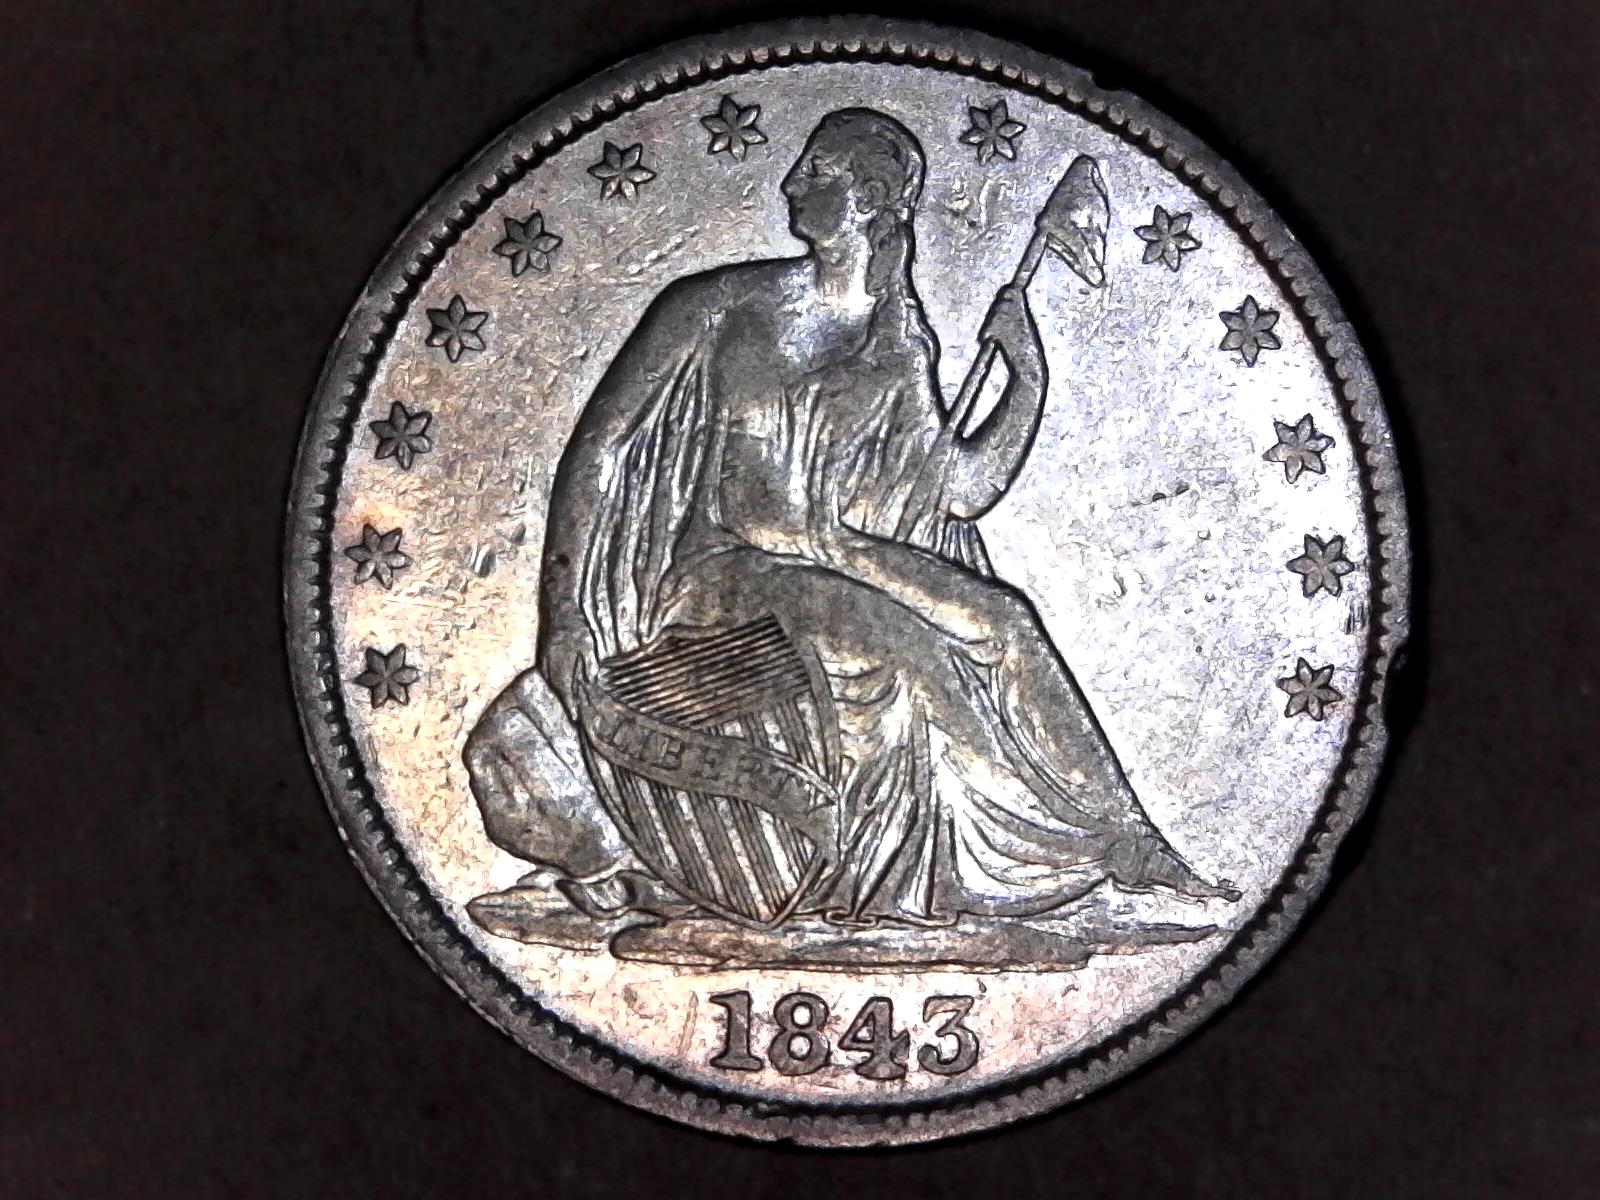 1843 WB 2 Obv.jpg